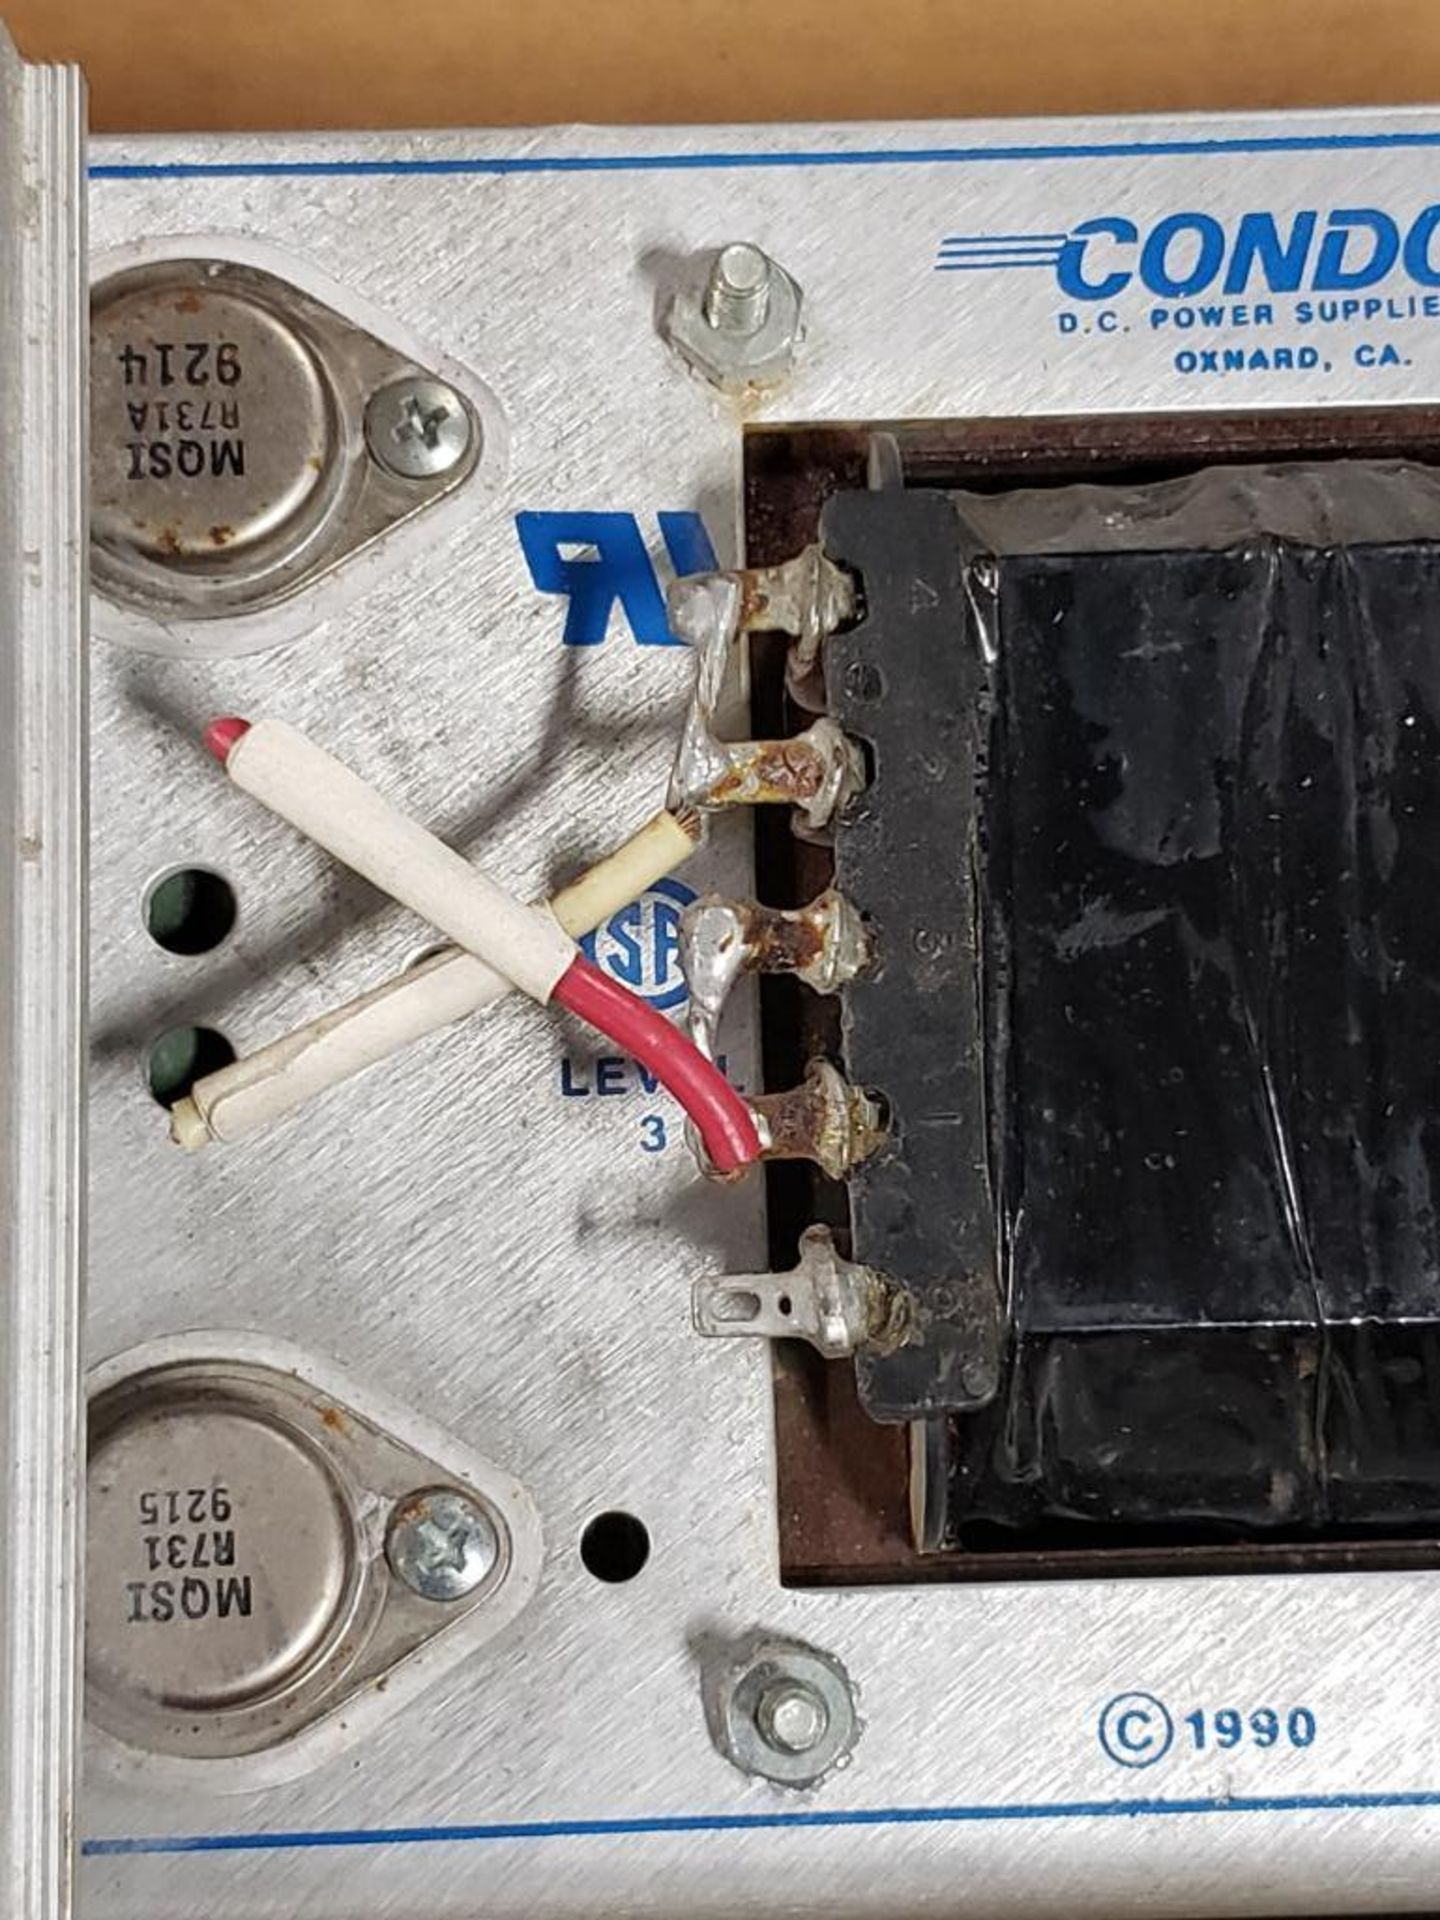 Condor F24-12-A+ Power supply. - Image 4 of 6